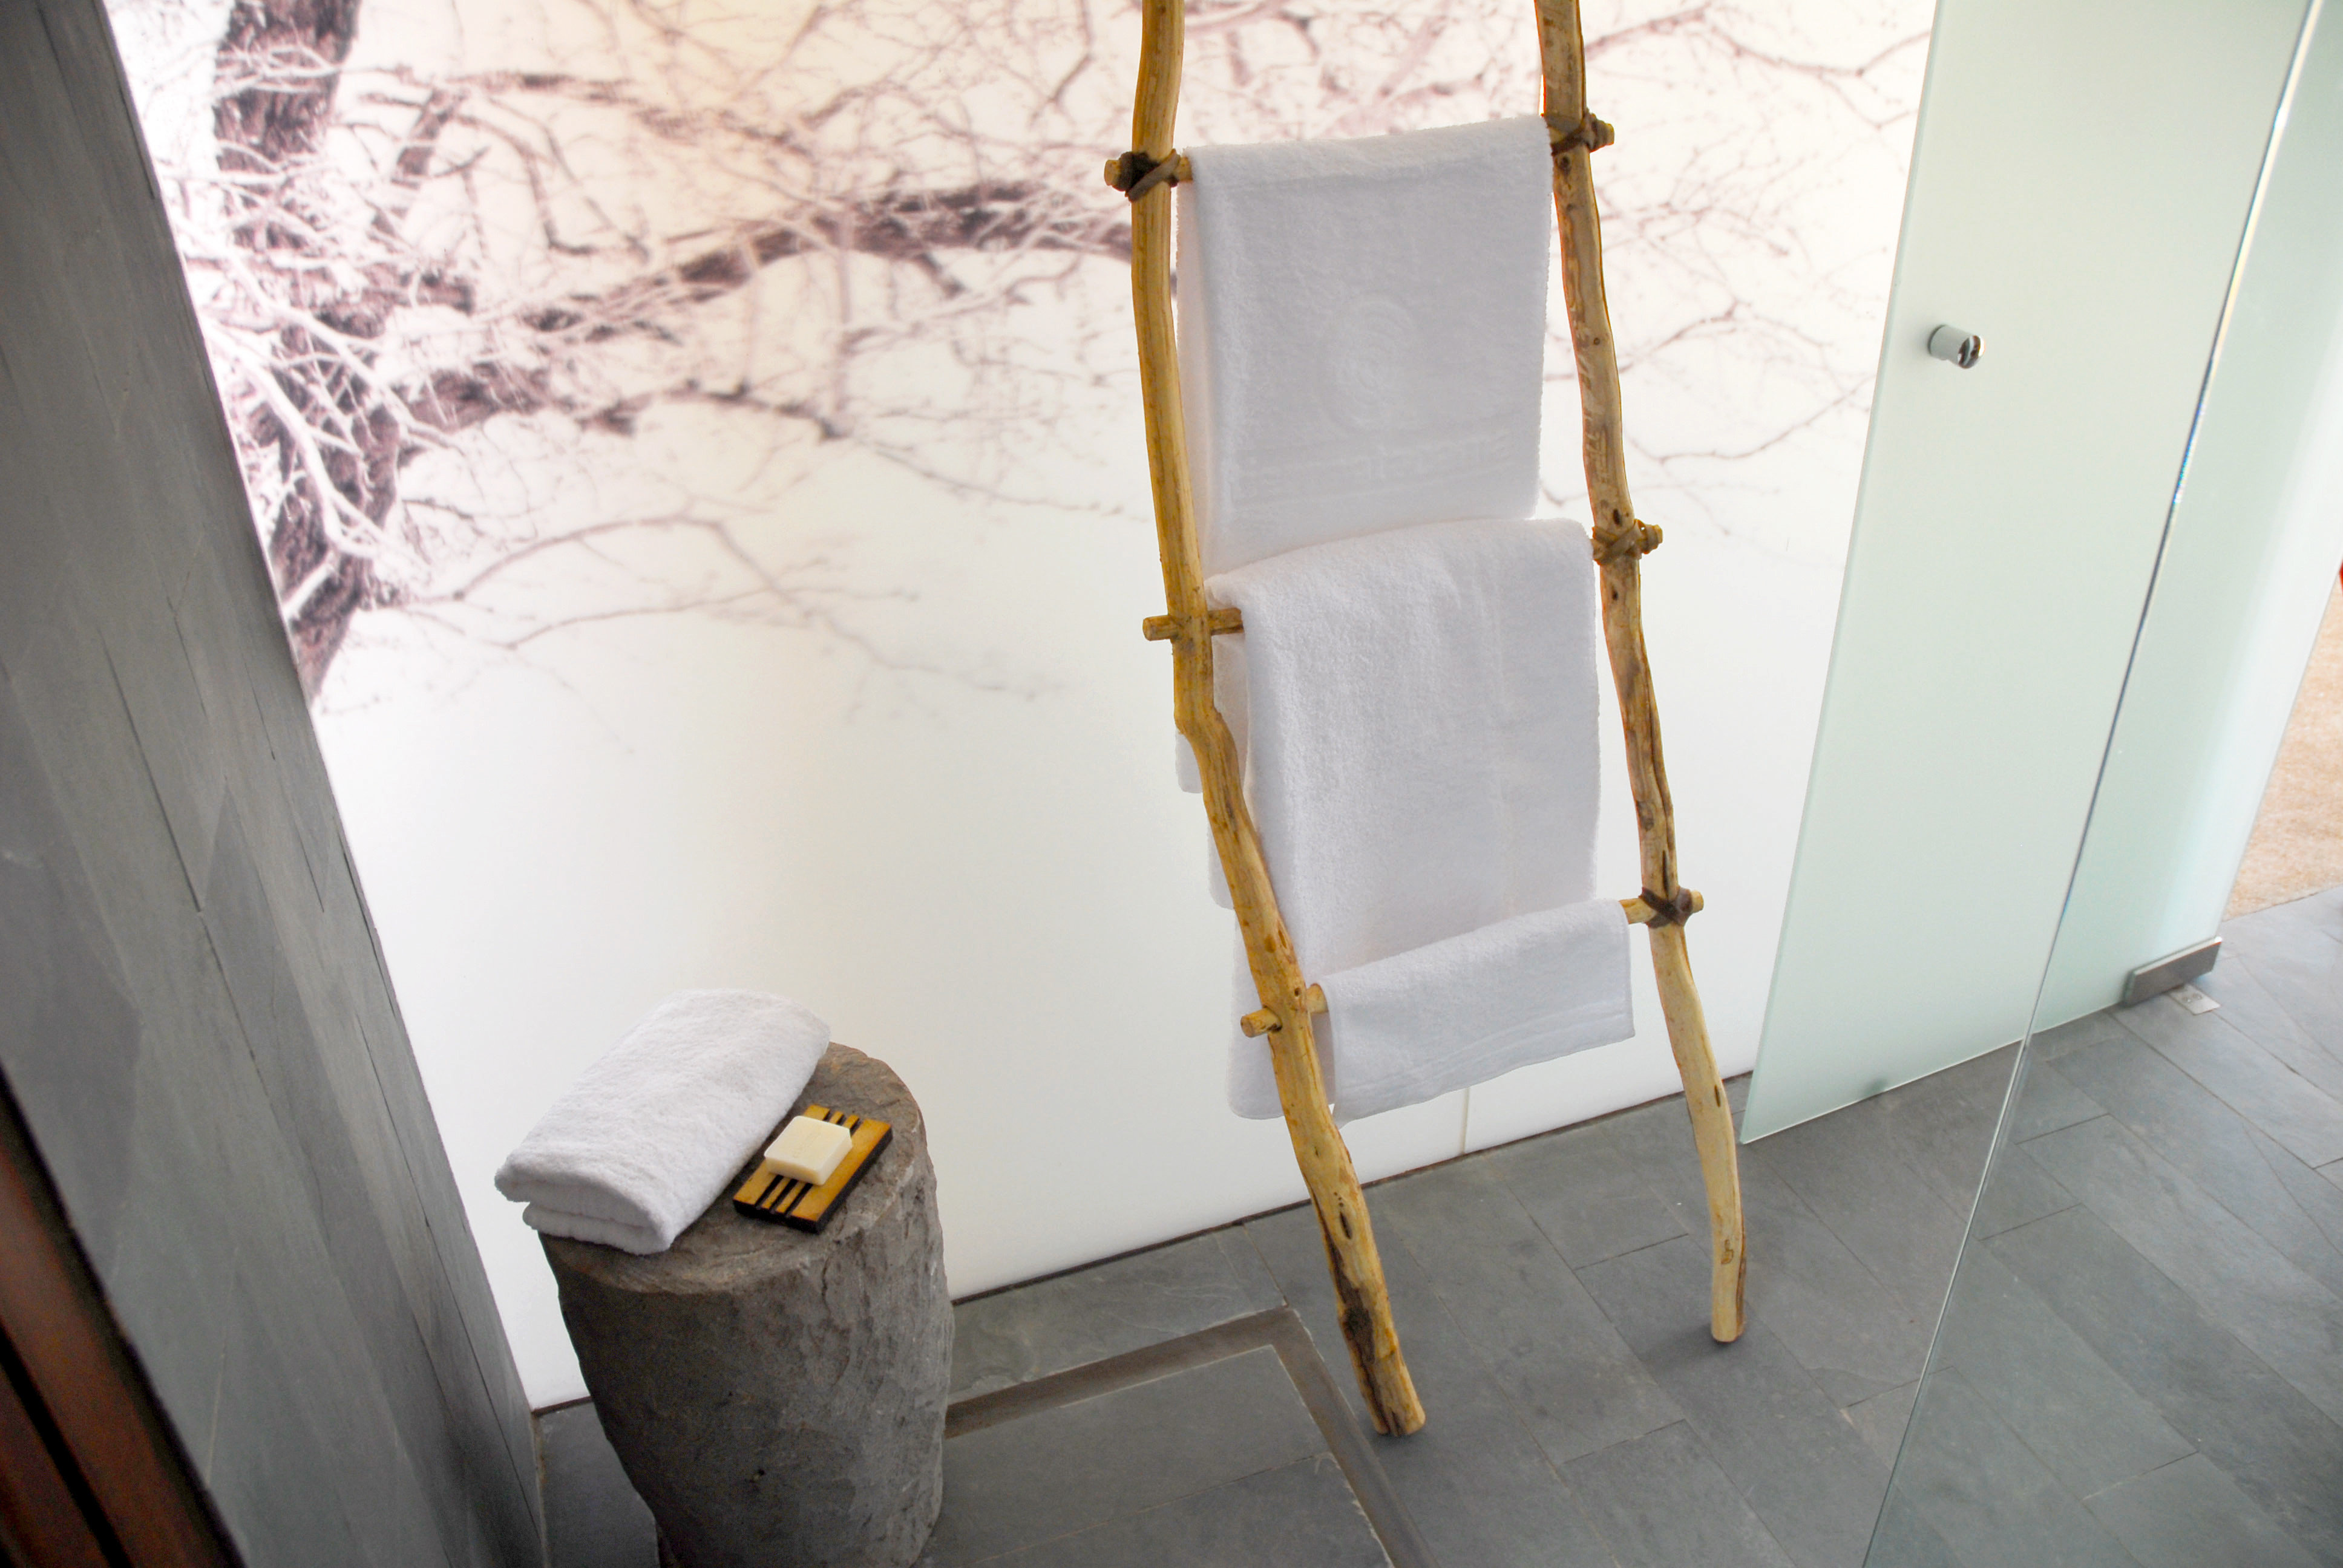 Bath Luxury Spa white house product flooring home